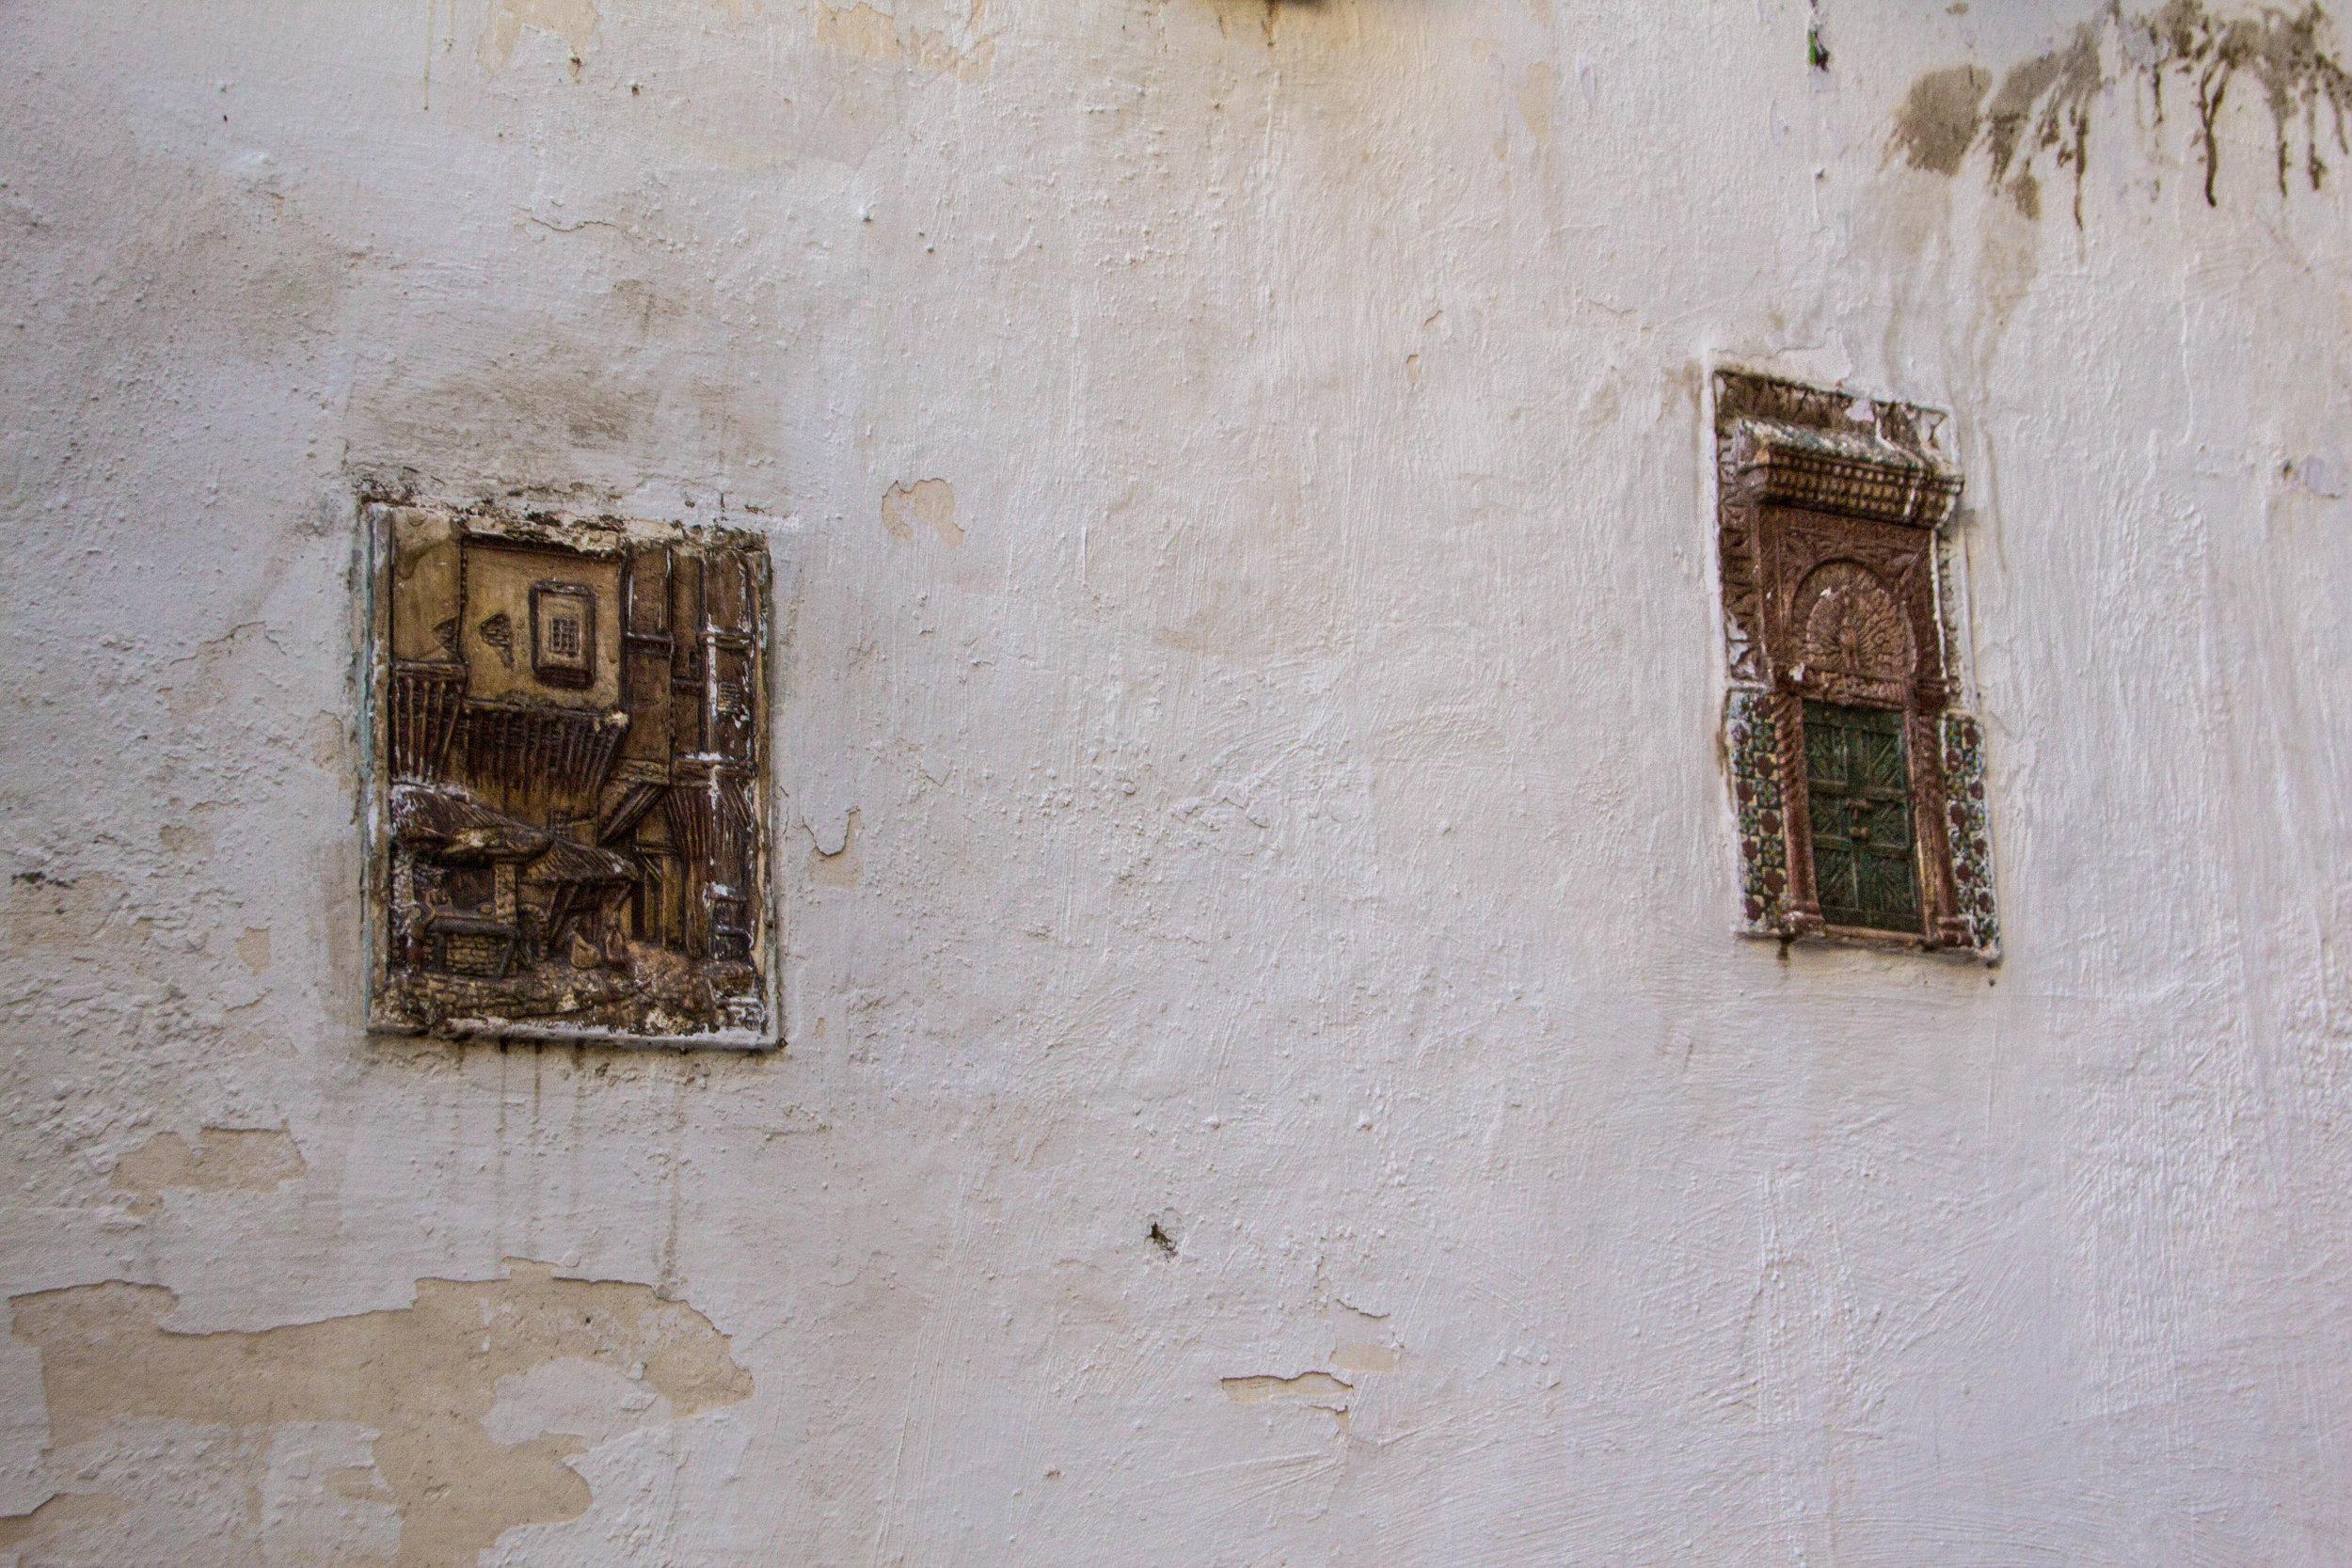 casbah-photography-algiers-algeria-alger-32.jpg